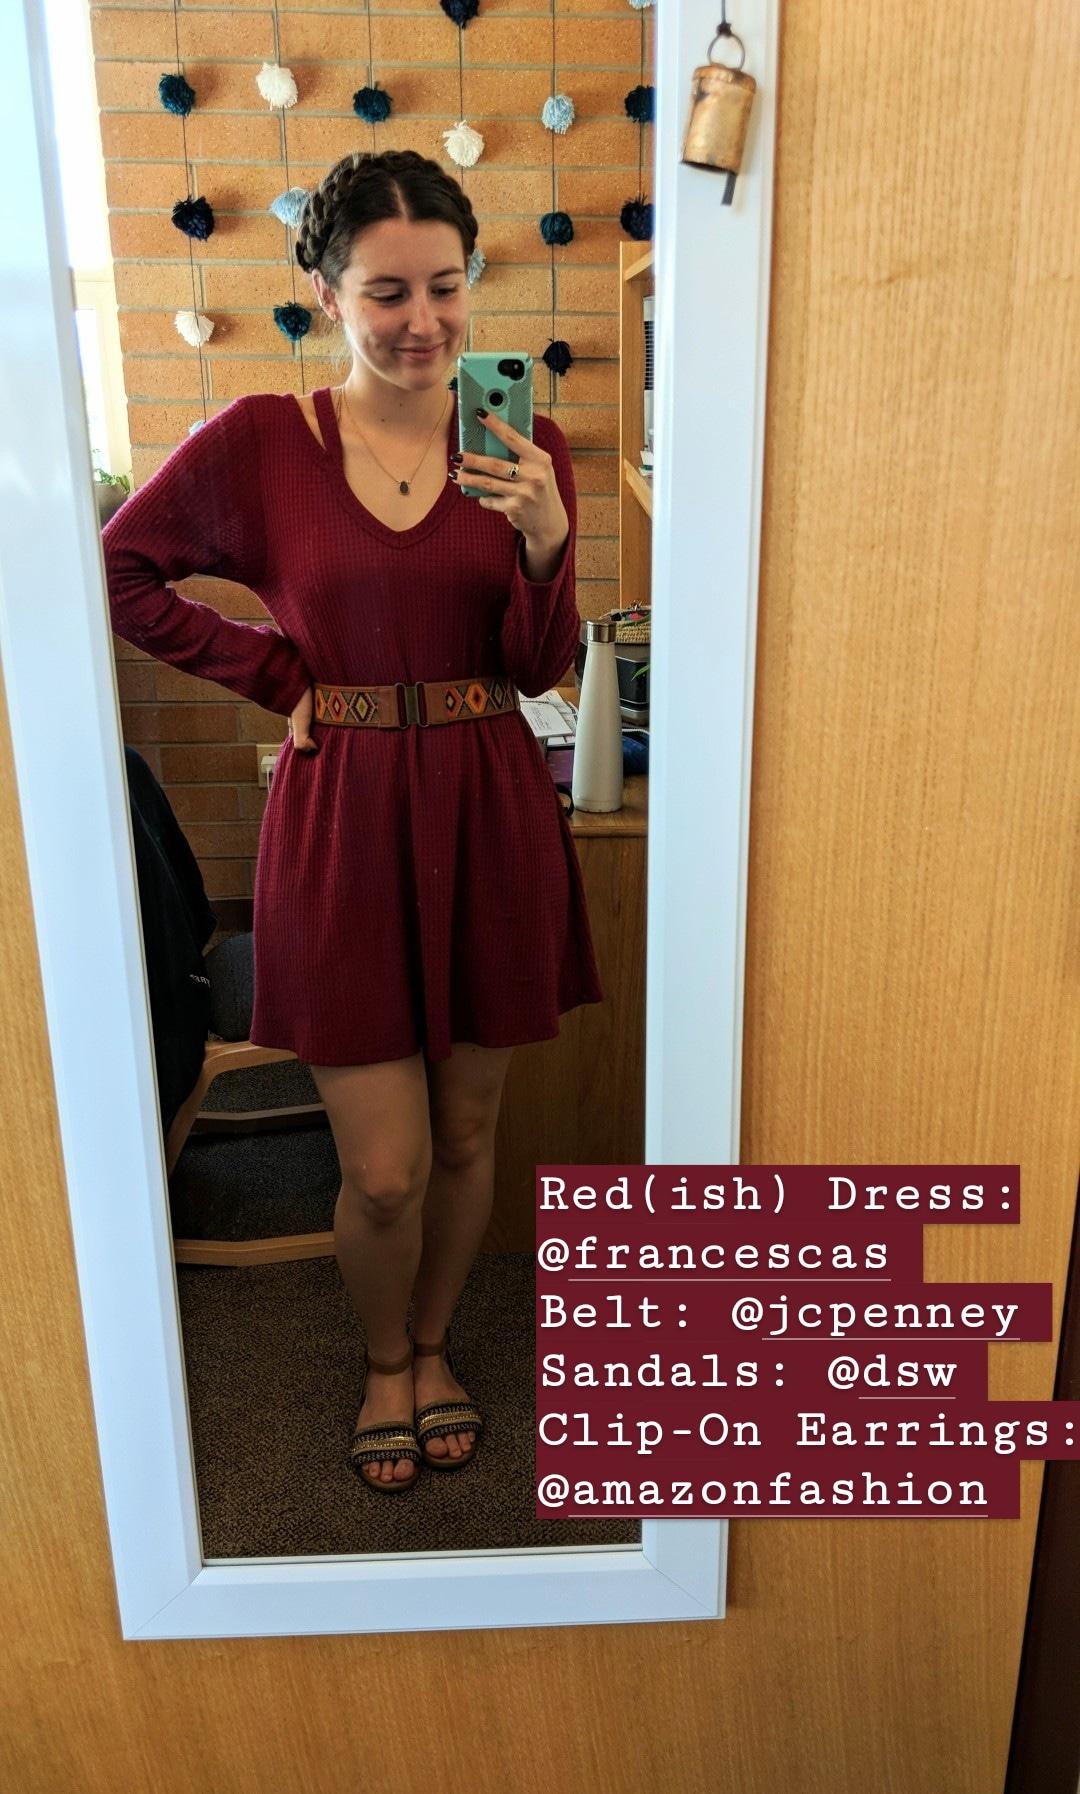 red dress, Francesca's, brown sandals, milkmaid braids